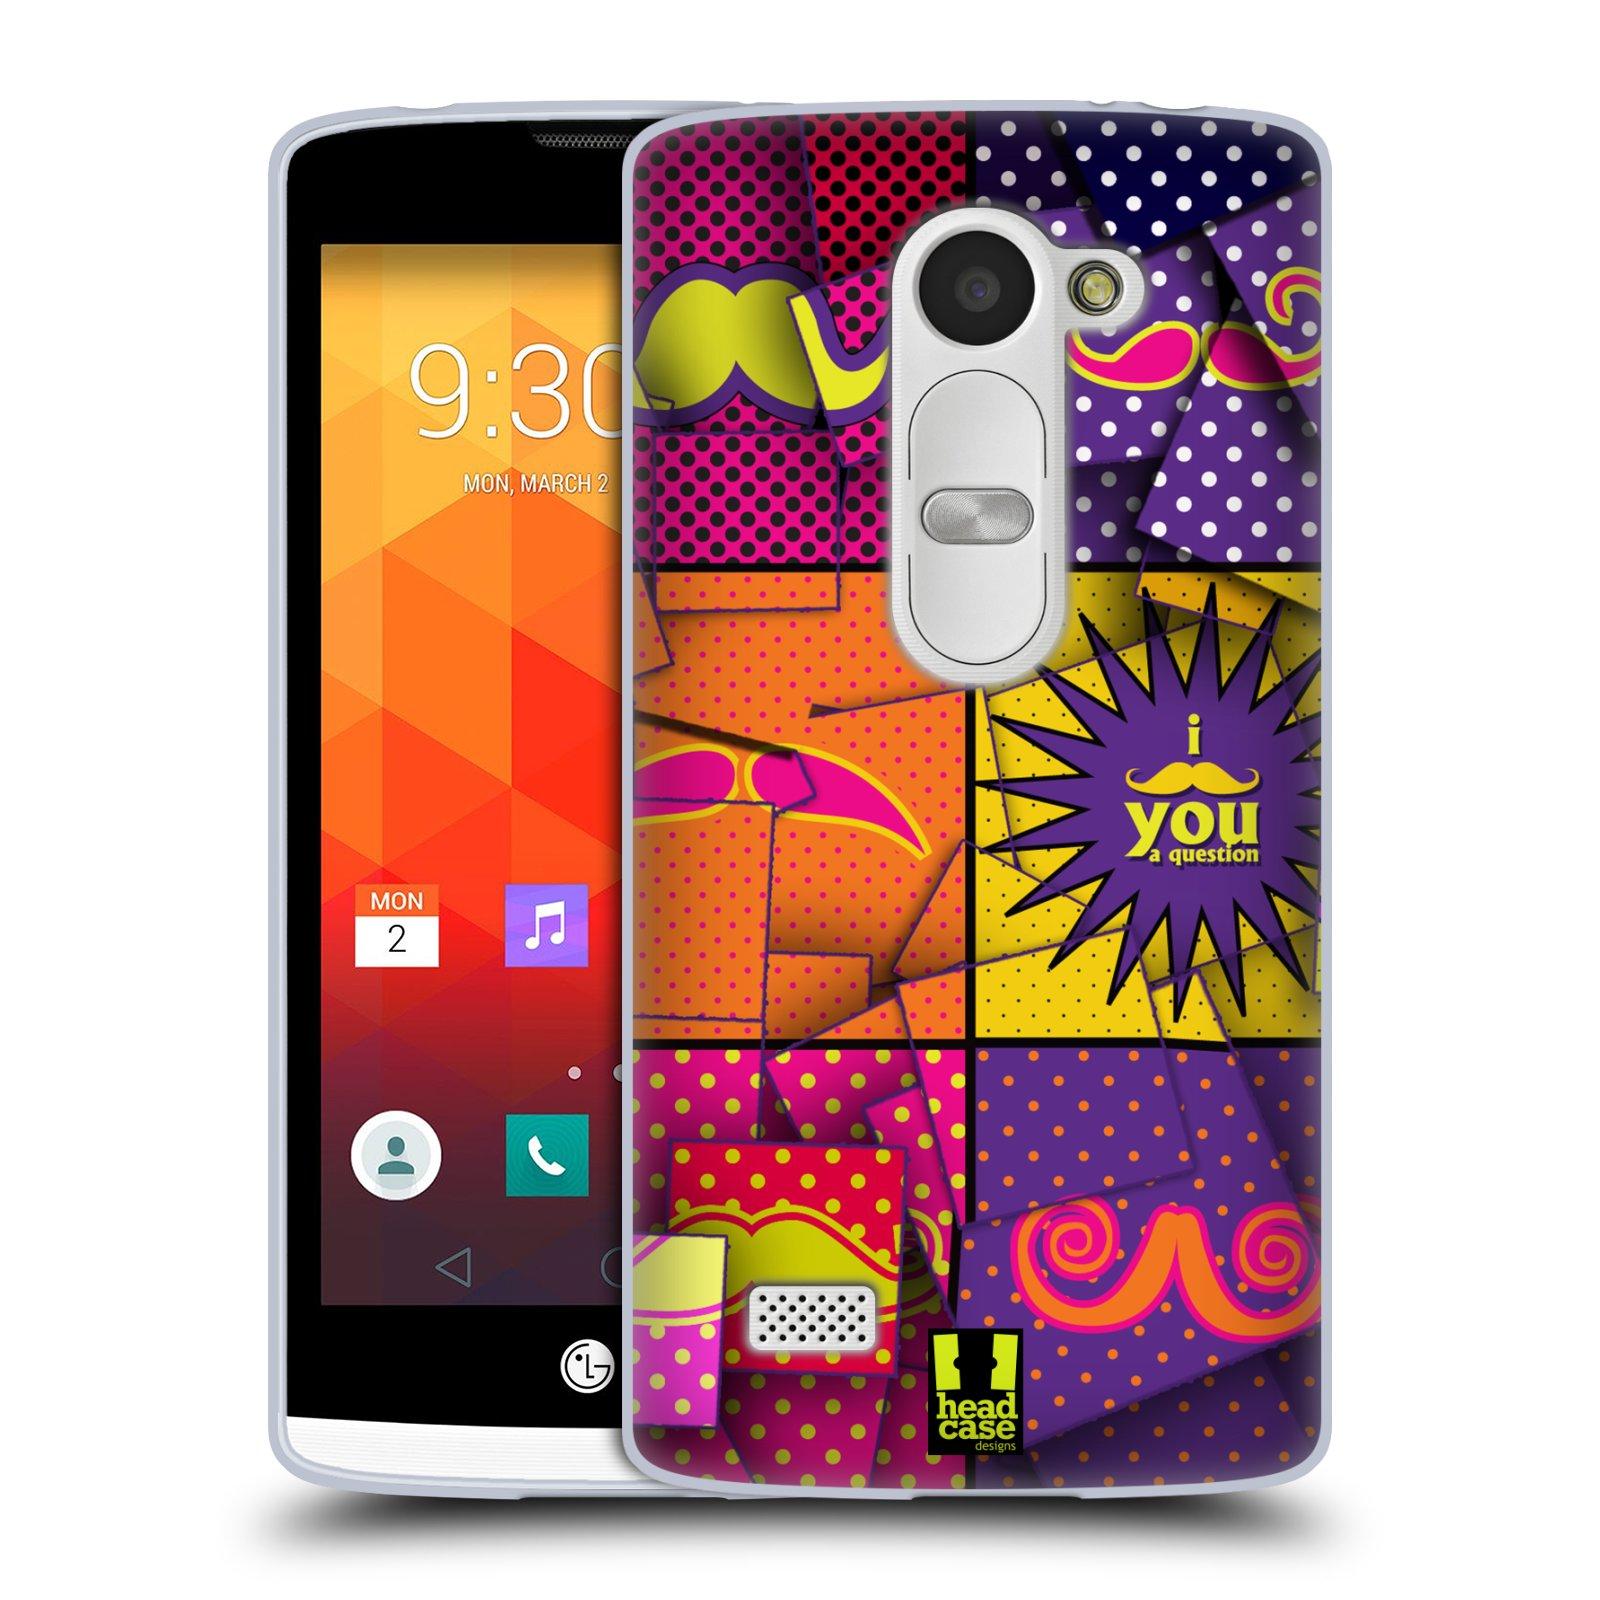 Silikonové pouzdro na mobil LG Leon LTE HEAD CASE POP ART KNÍRY (Silikonový kryt či obal na mobilní telefon LG Leon H320 a LG Leon LTE H340N)